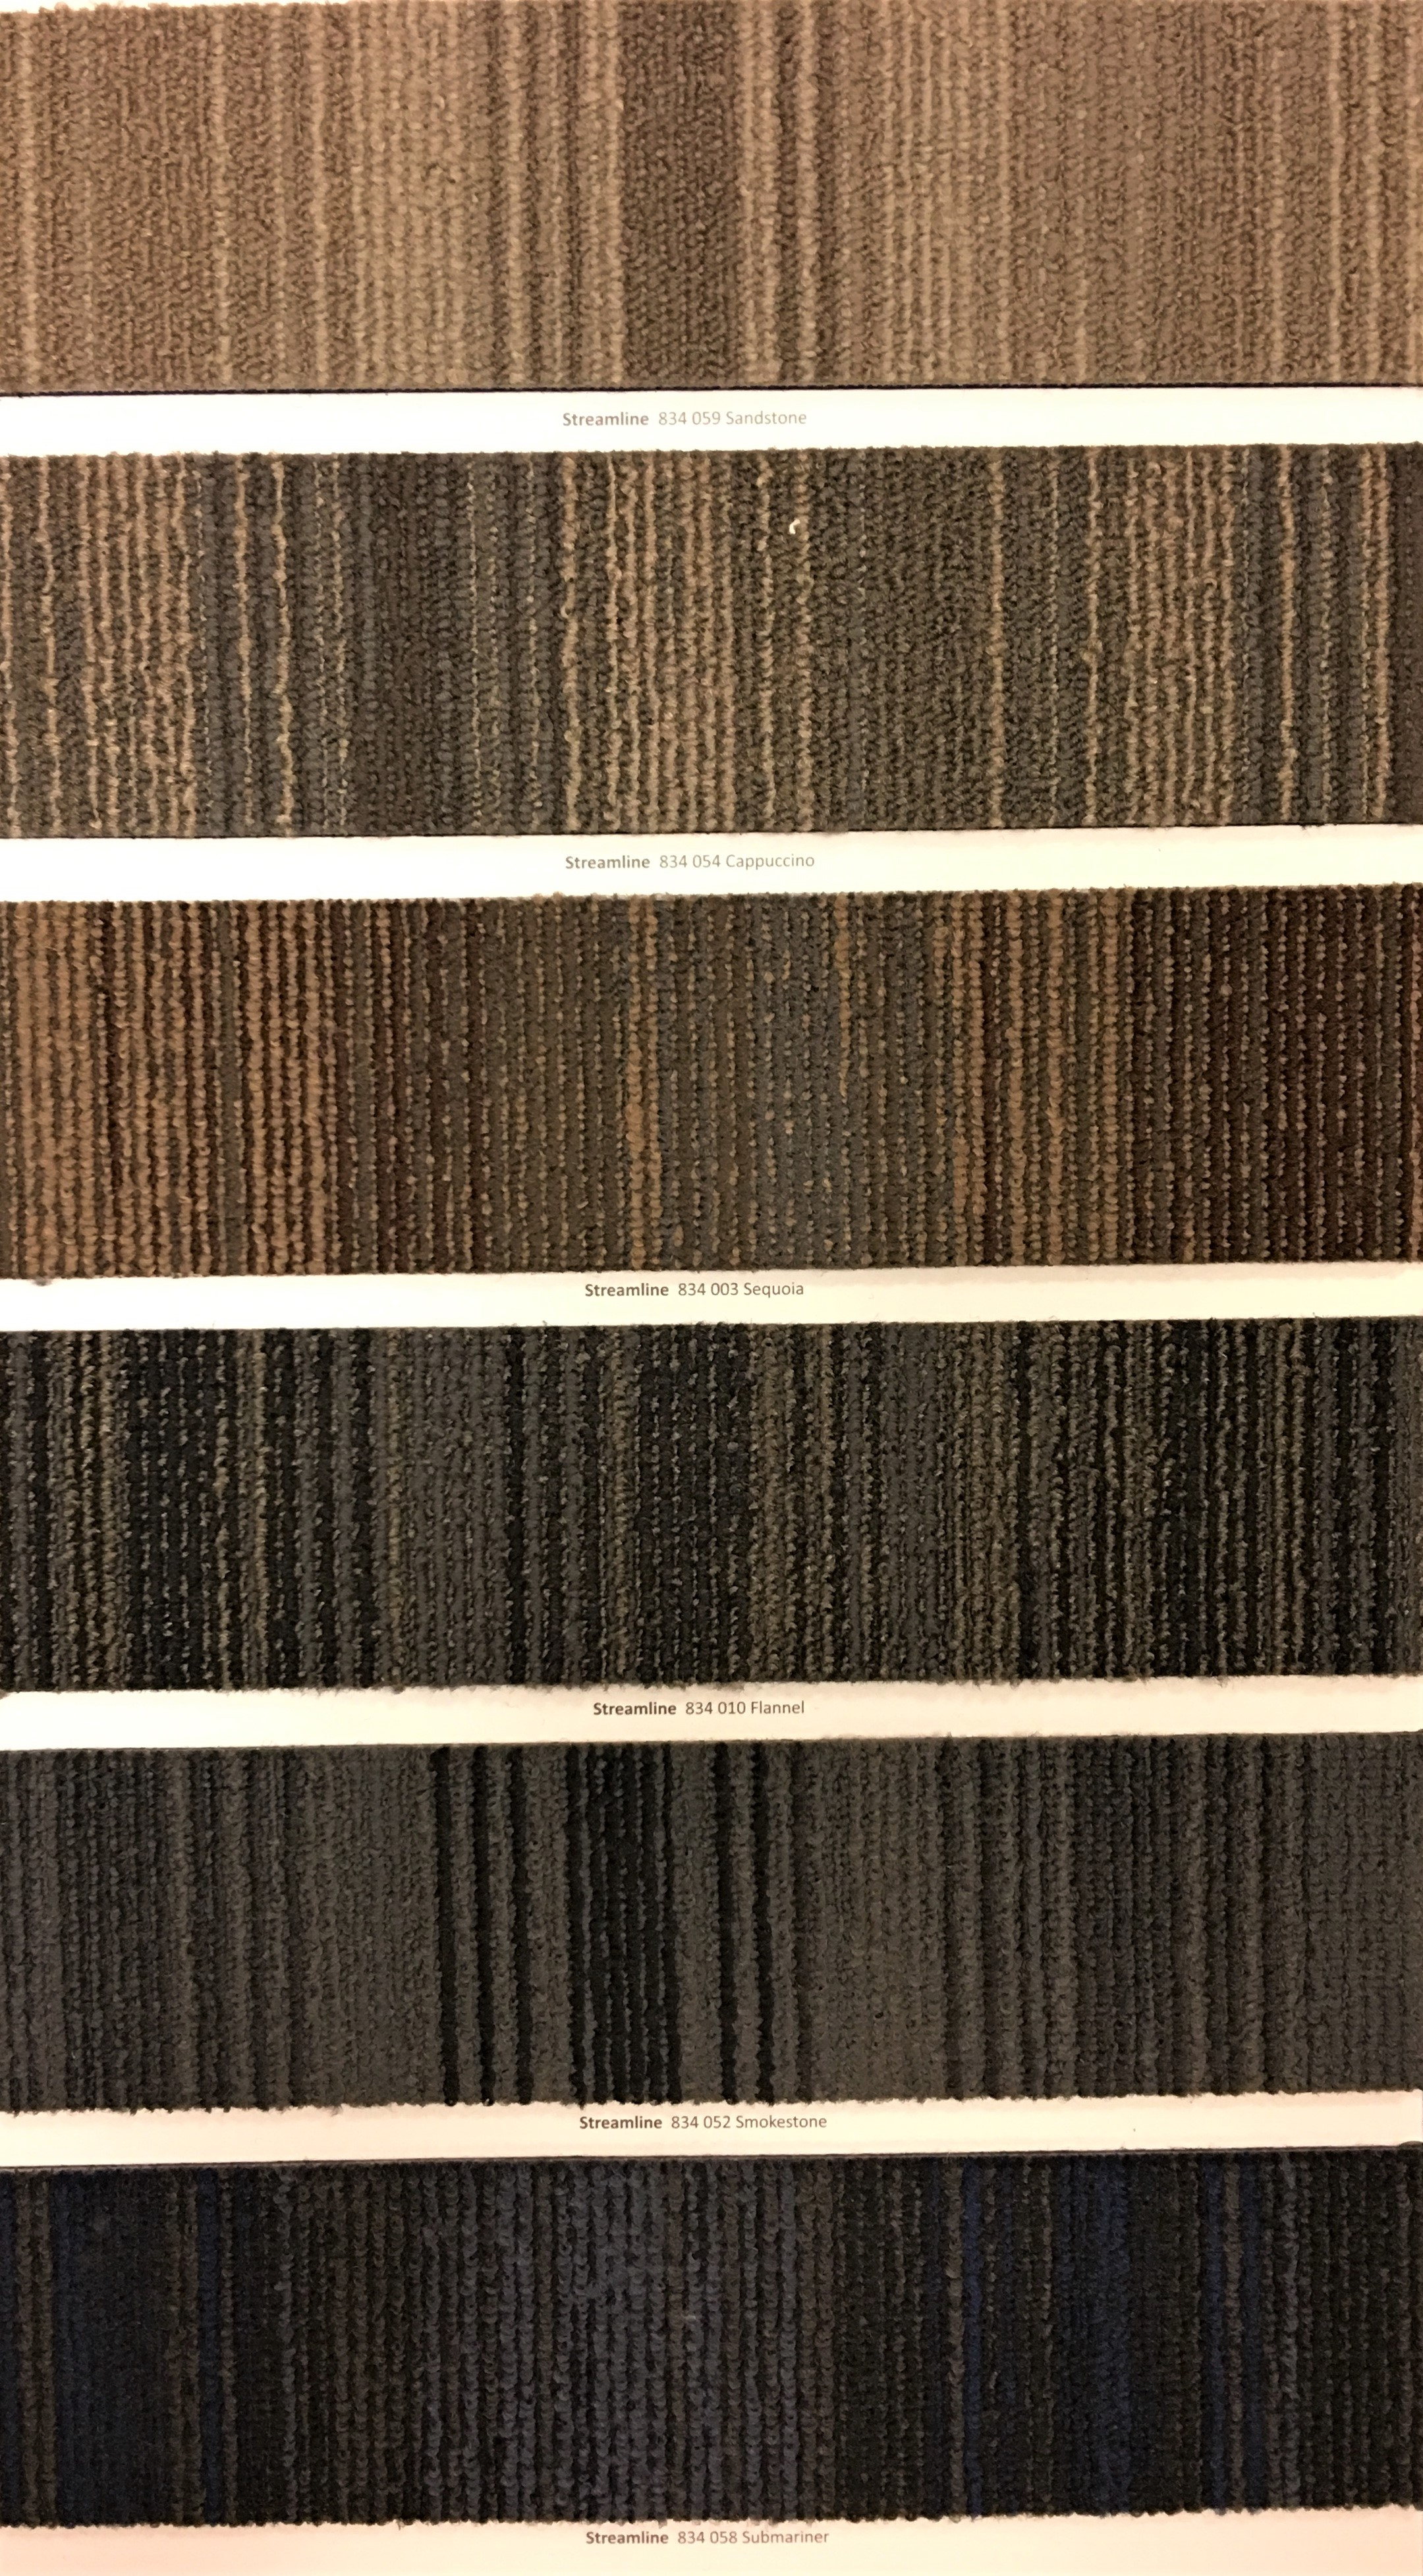 Spectrum Carpet Collection Streamline Spectrum